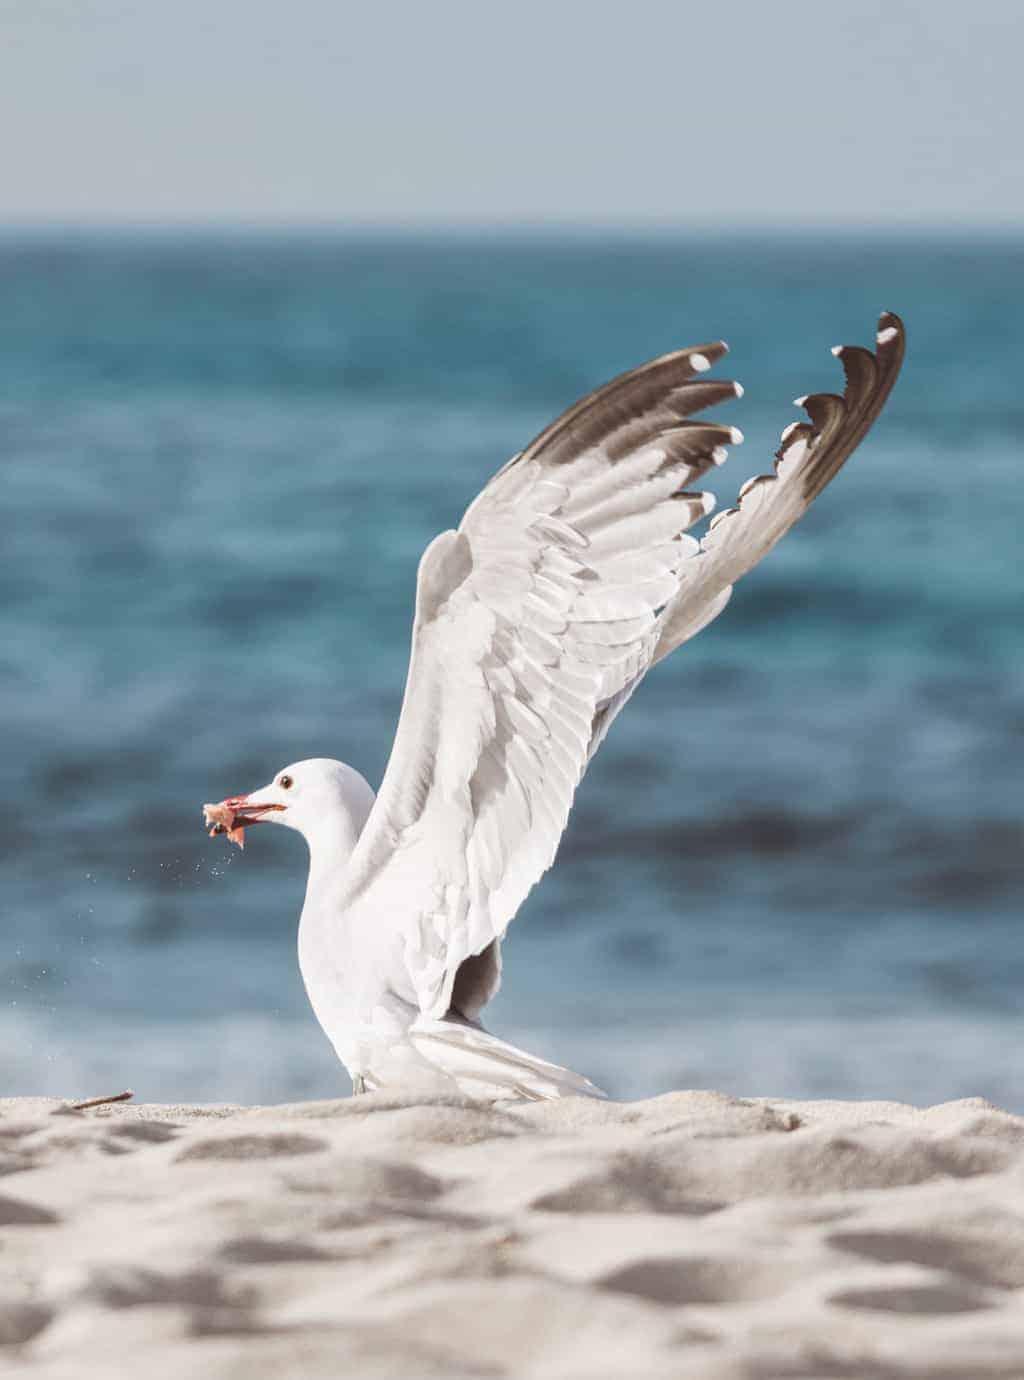 Seagull on a beach in Mallorca